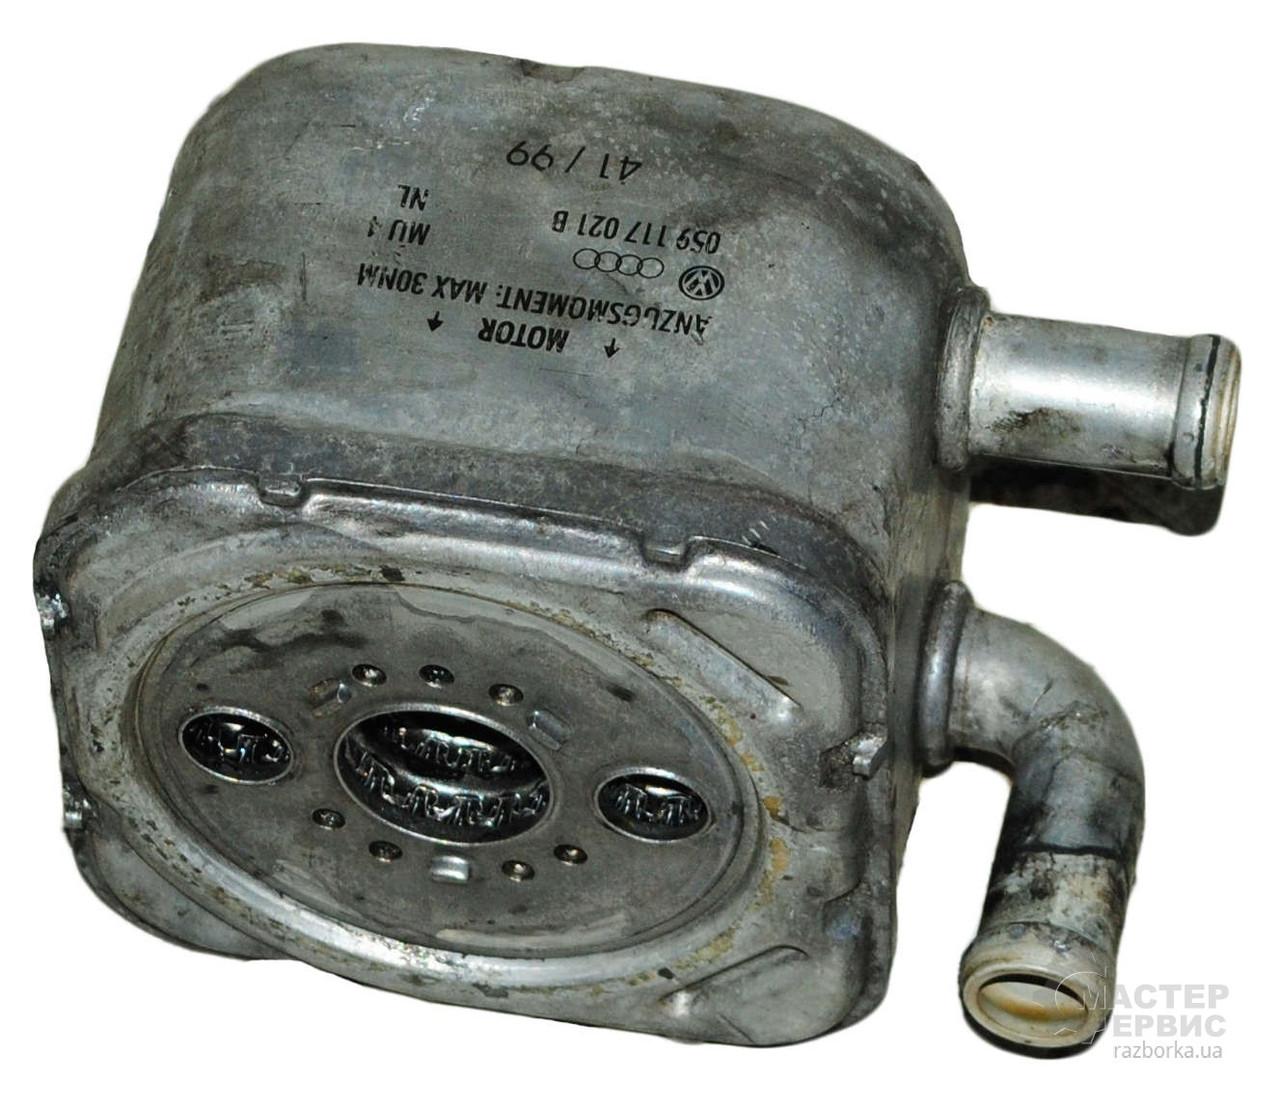 Теплообменник цена ауди как заменит теплообменник на газ